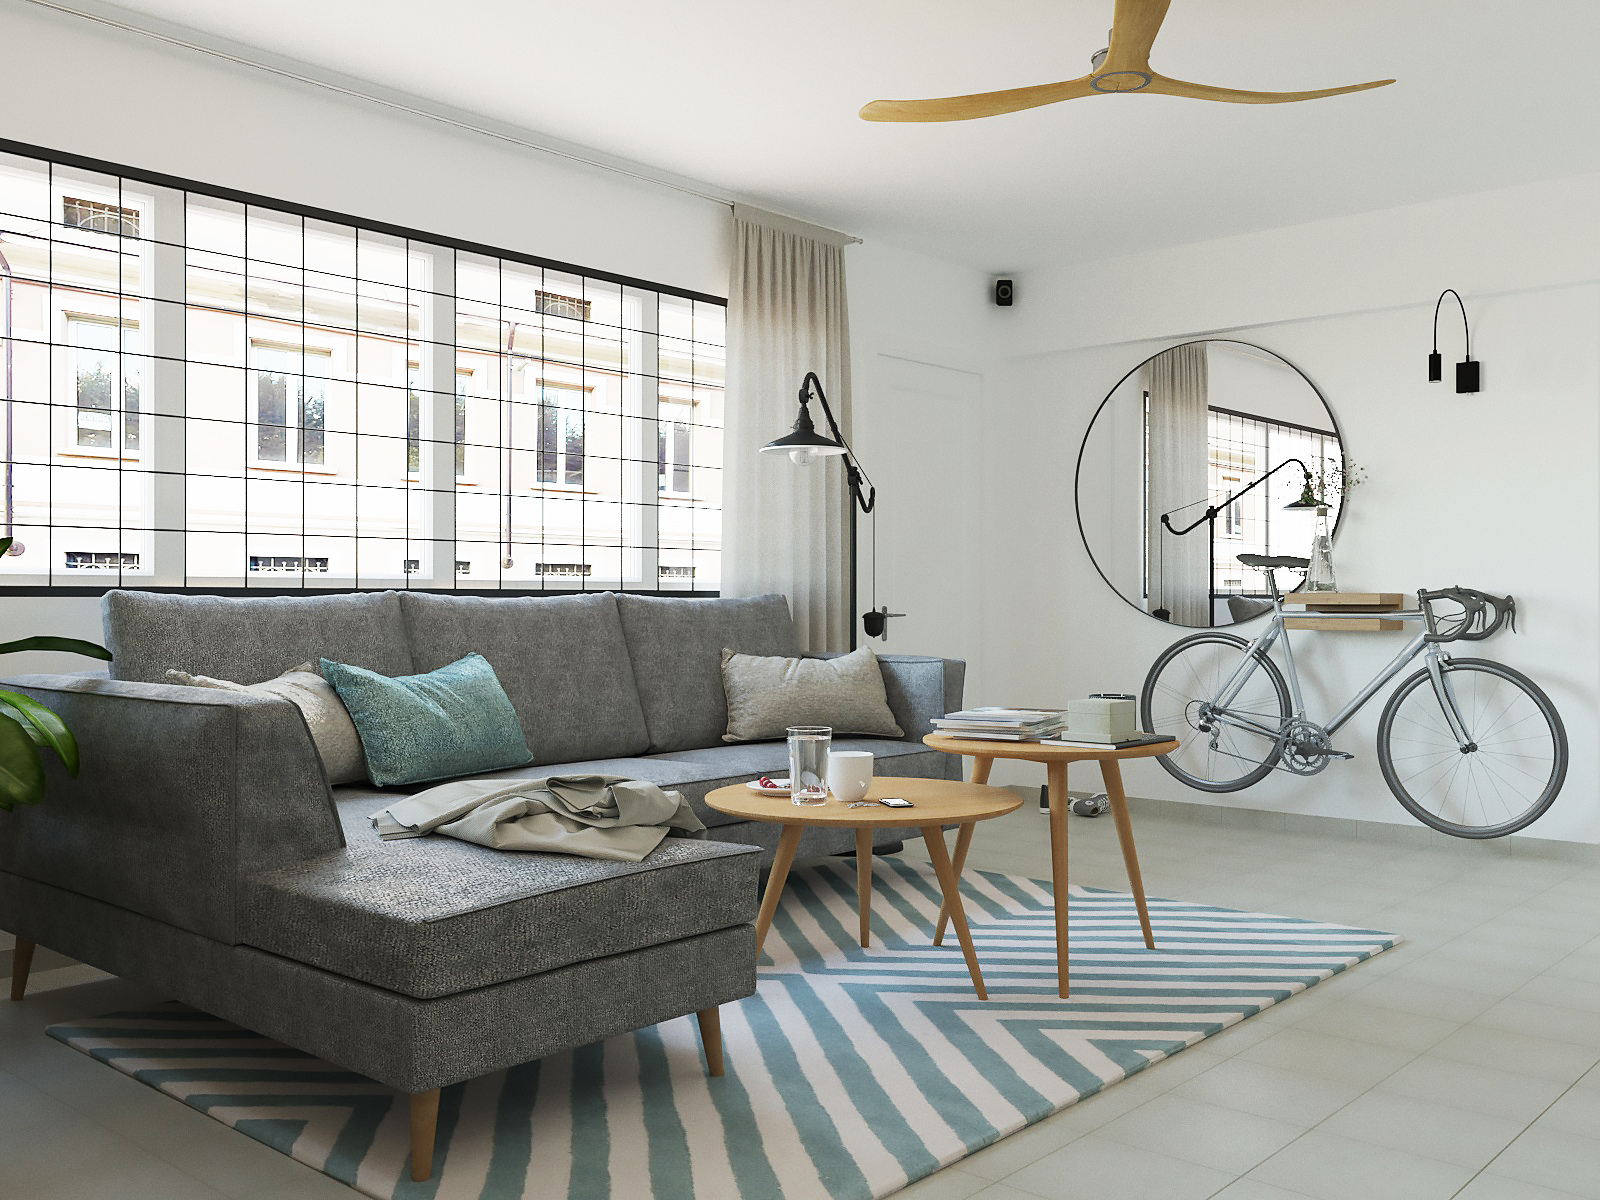 hdb interior white decor